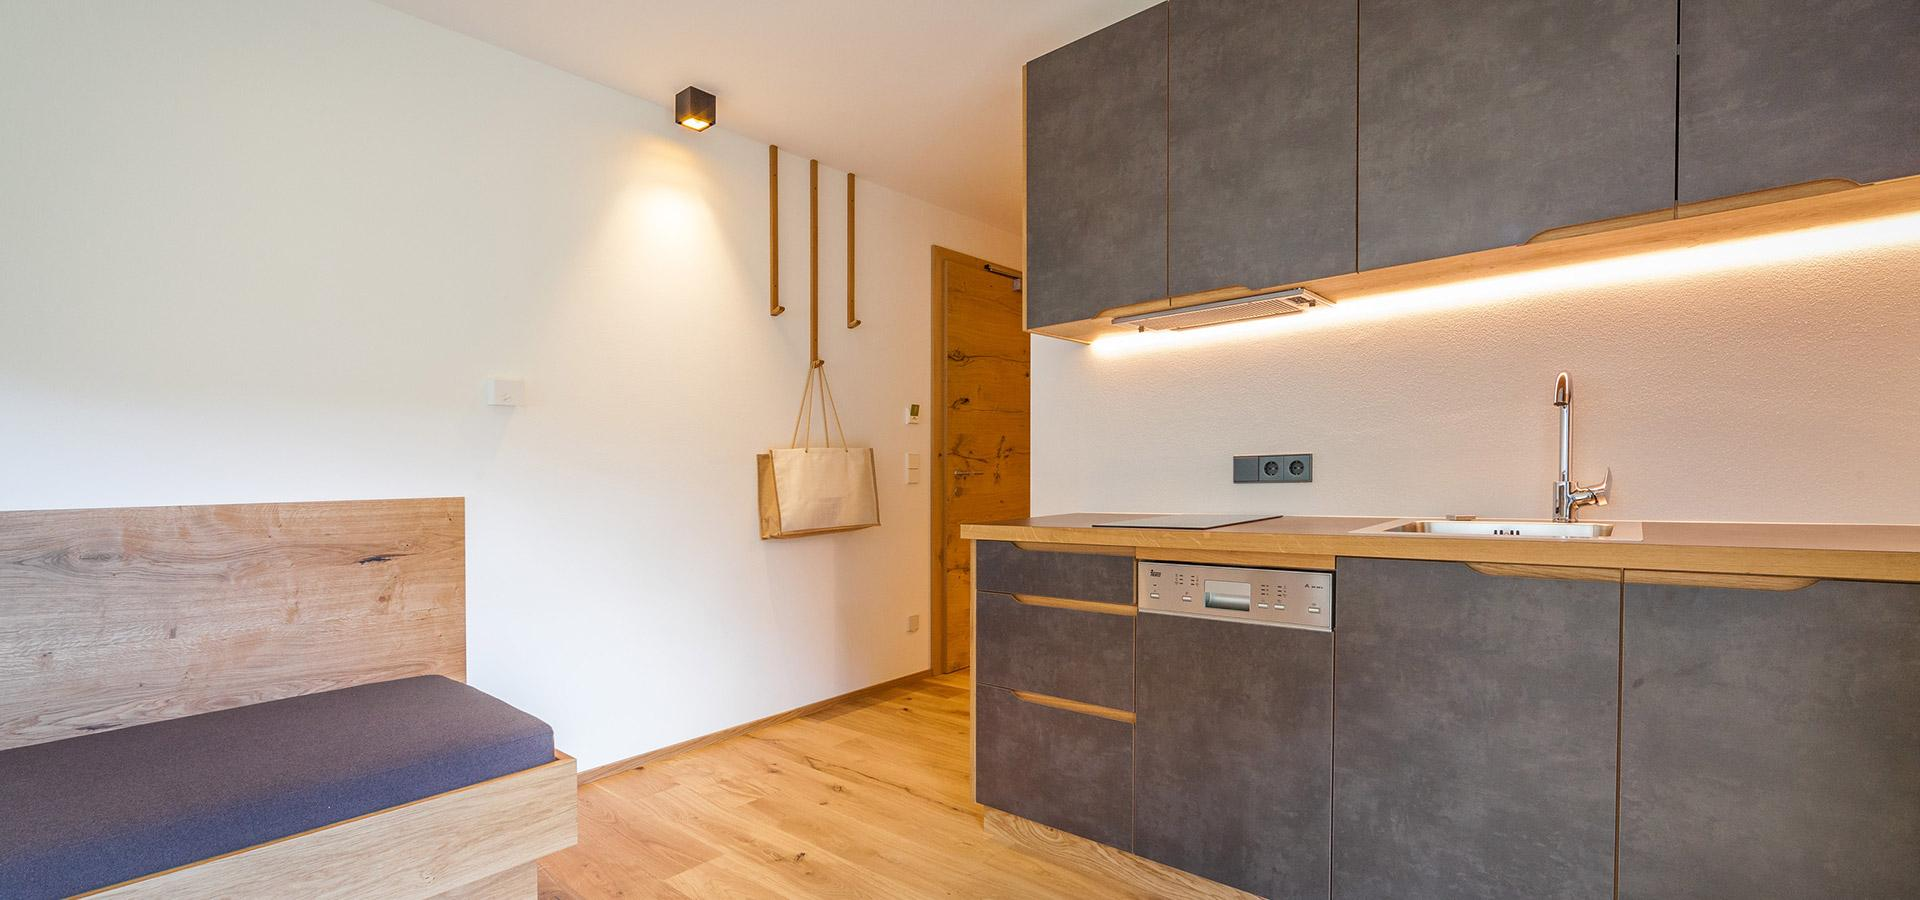 Küchenverkleidung  Wand-Bodenverkleidung – Livingdesign-Frankfurt